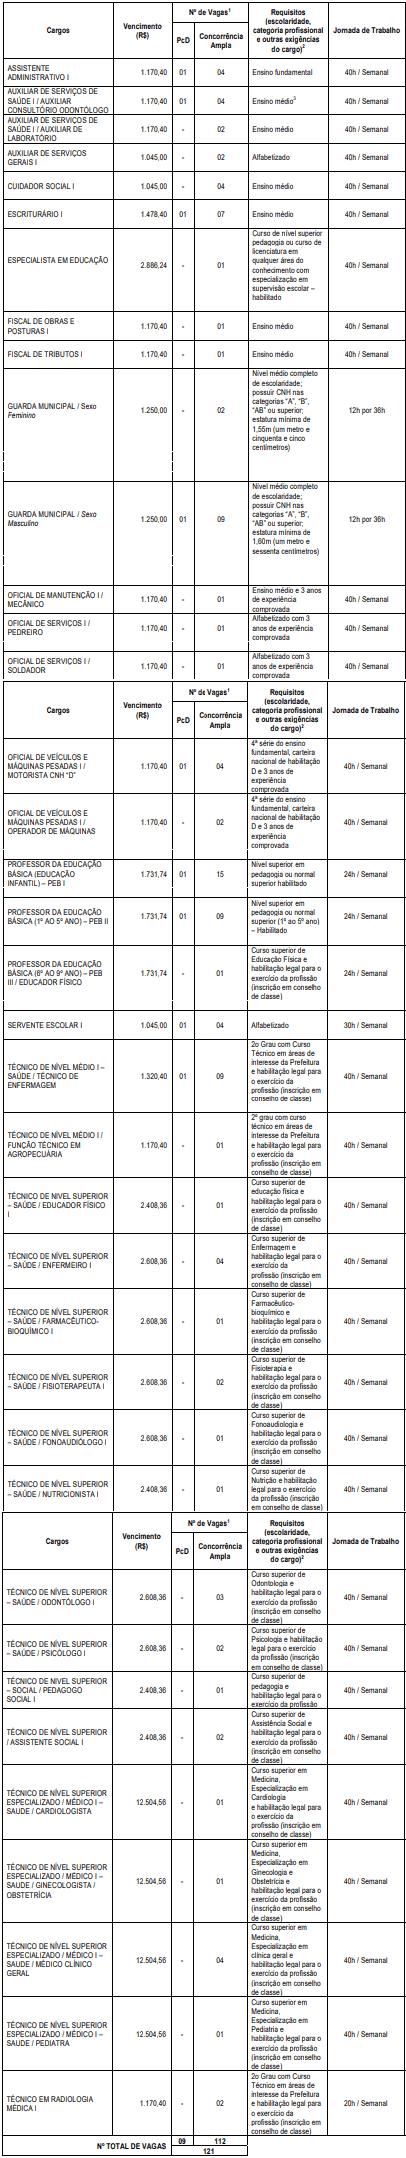 vagas5 2 - Concurso Prefeitura de Itamarandiba MG: Provas dia 31/01/2021